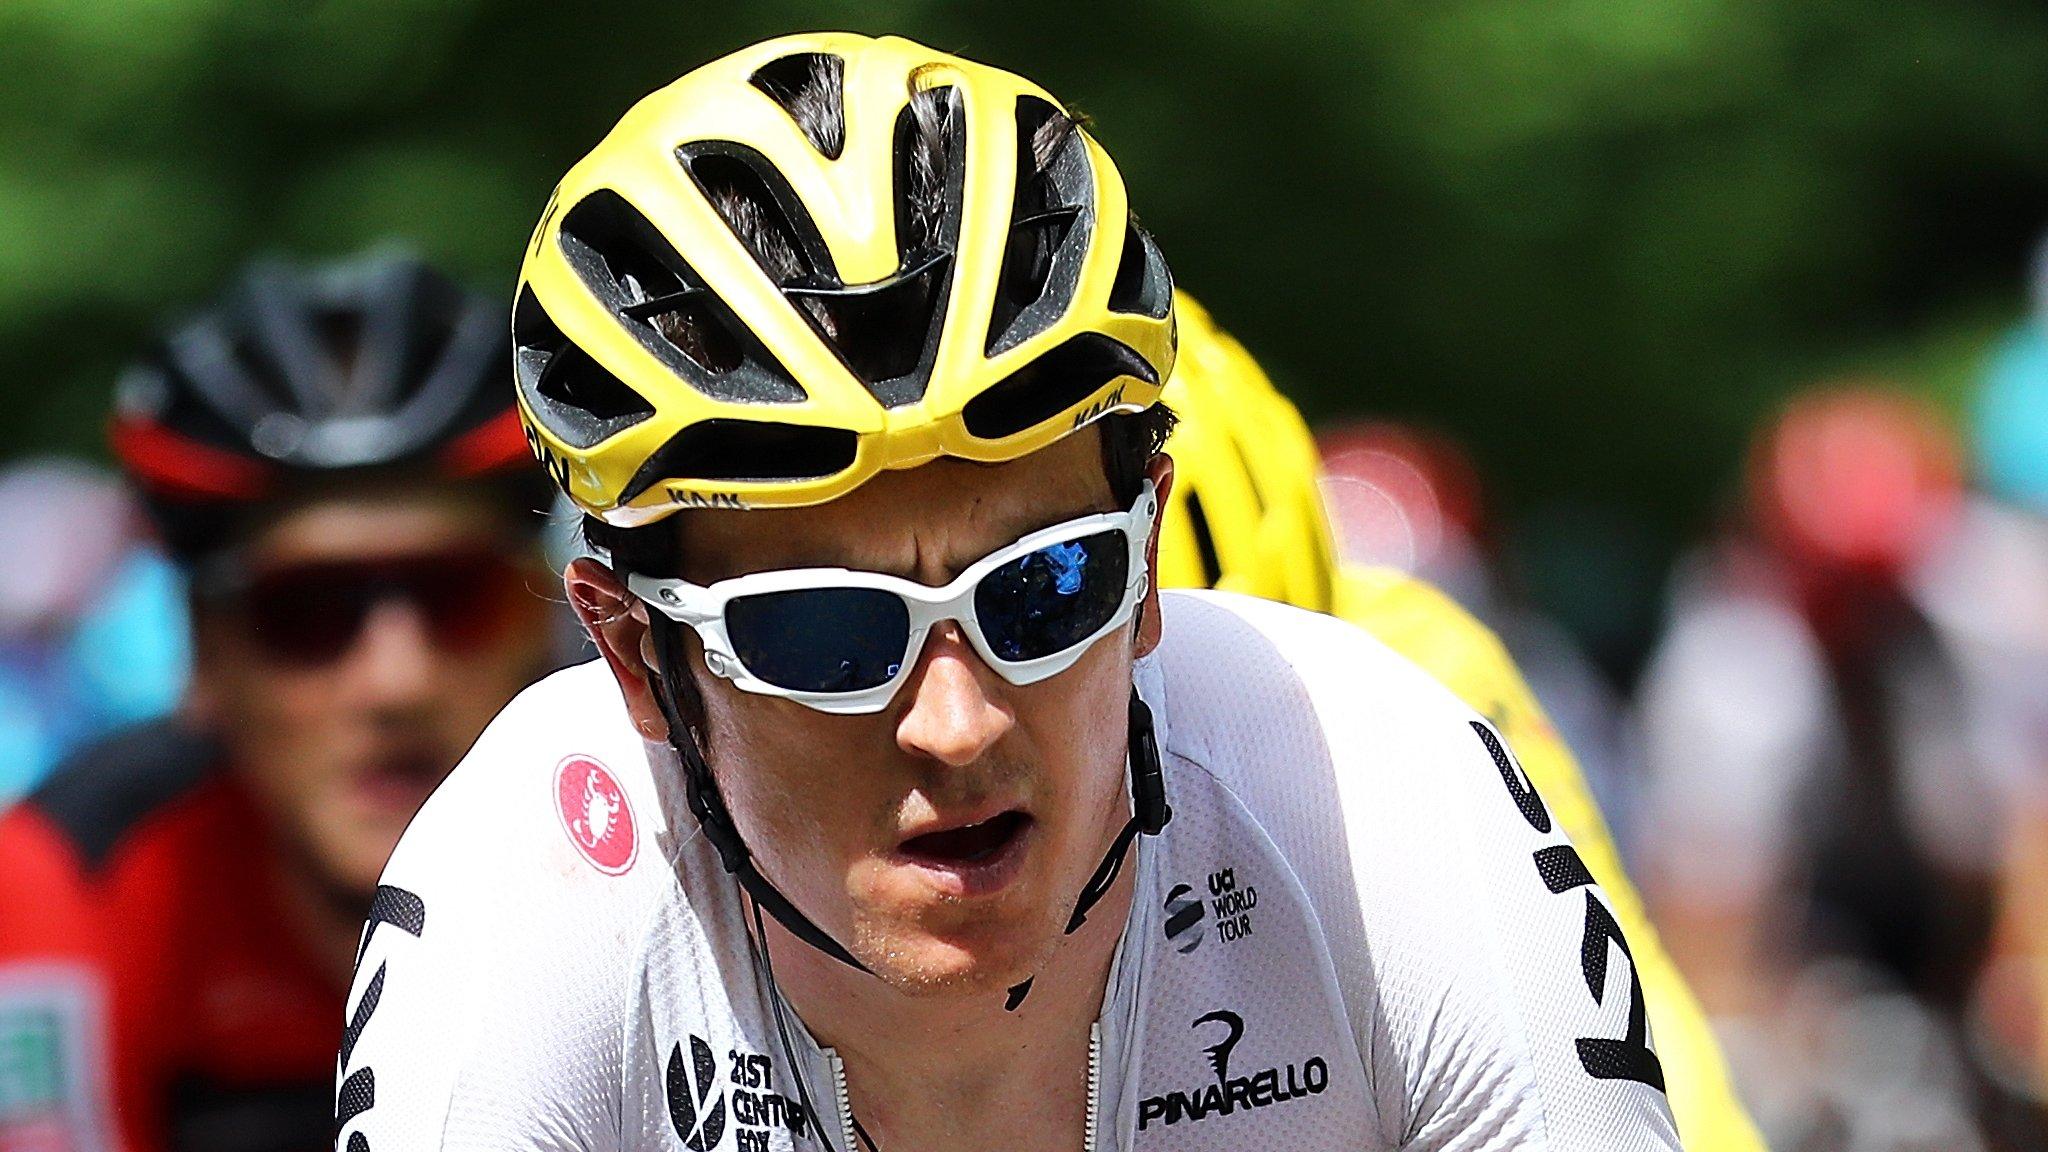 Volta ao Algarve: Team Sky's Geraint Thomas loses on last Algarve stage